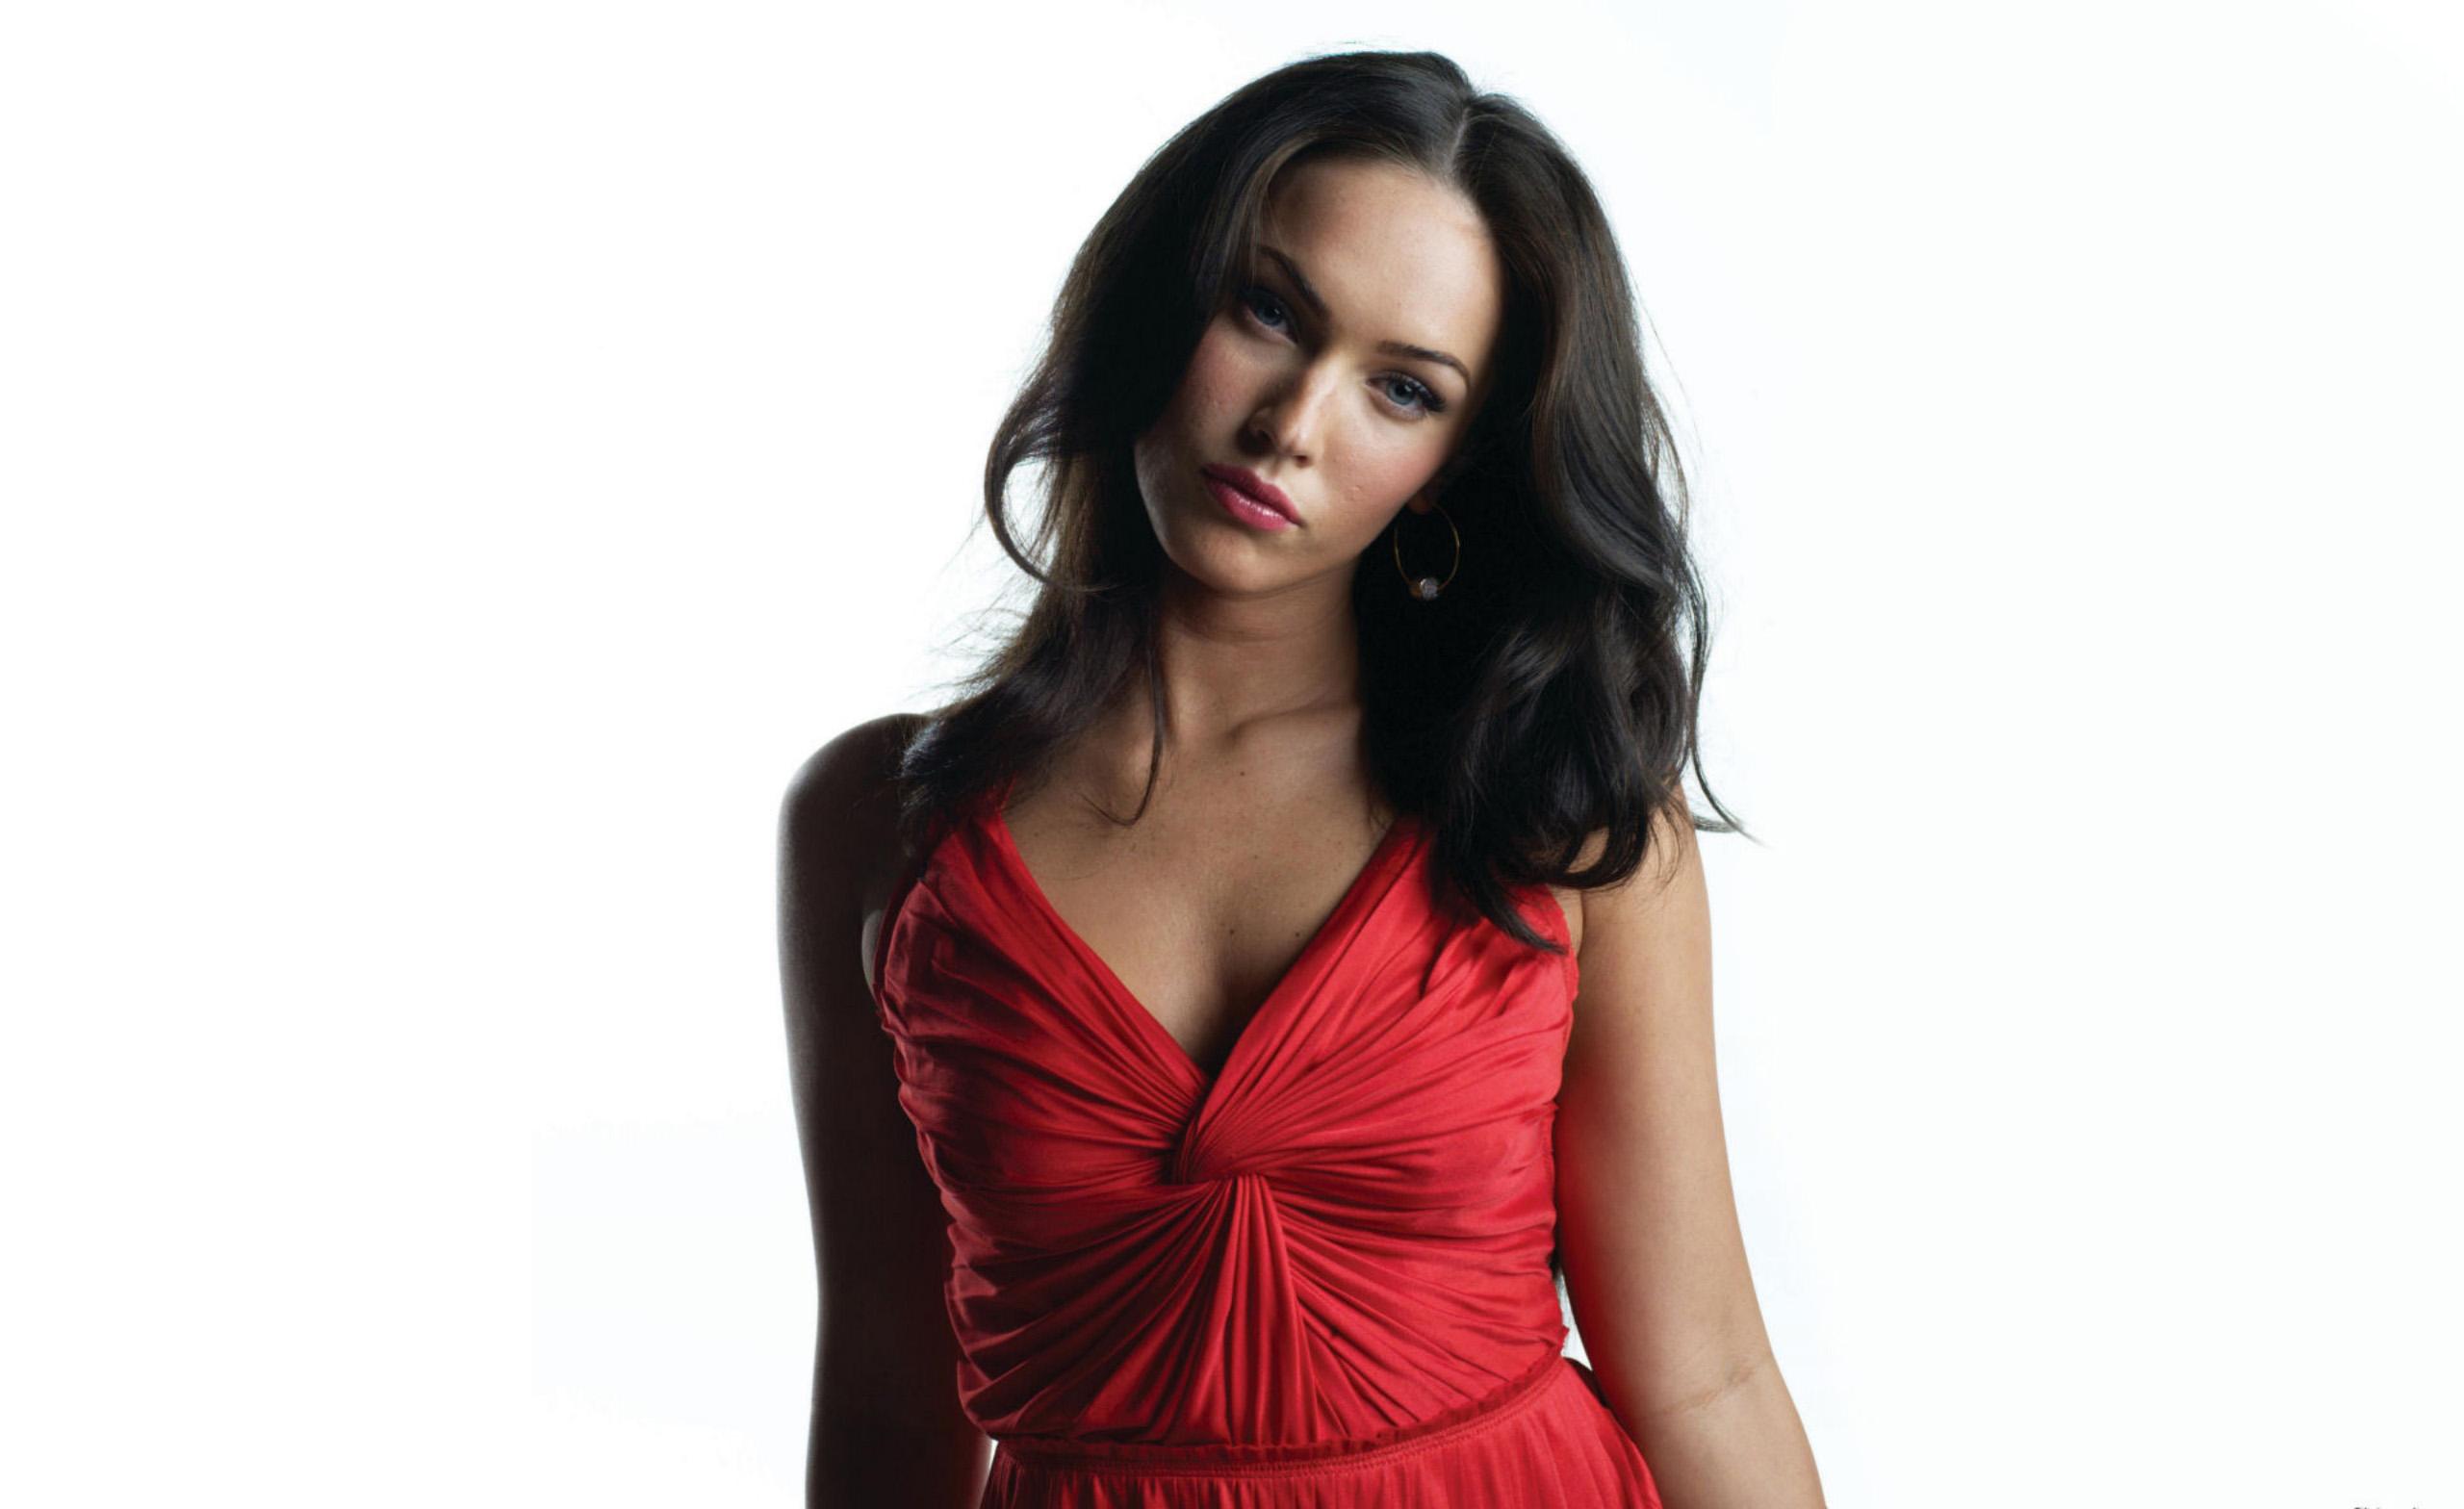 Megan fox hot red dress photoshoot full hd 2k wallpaper download original voltagebd Image collections